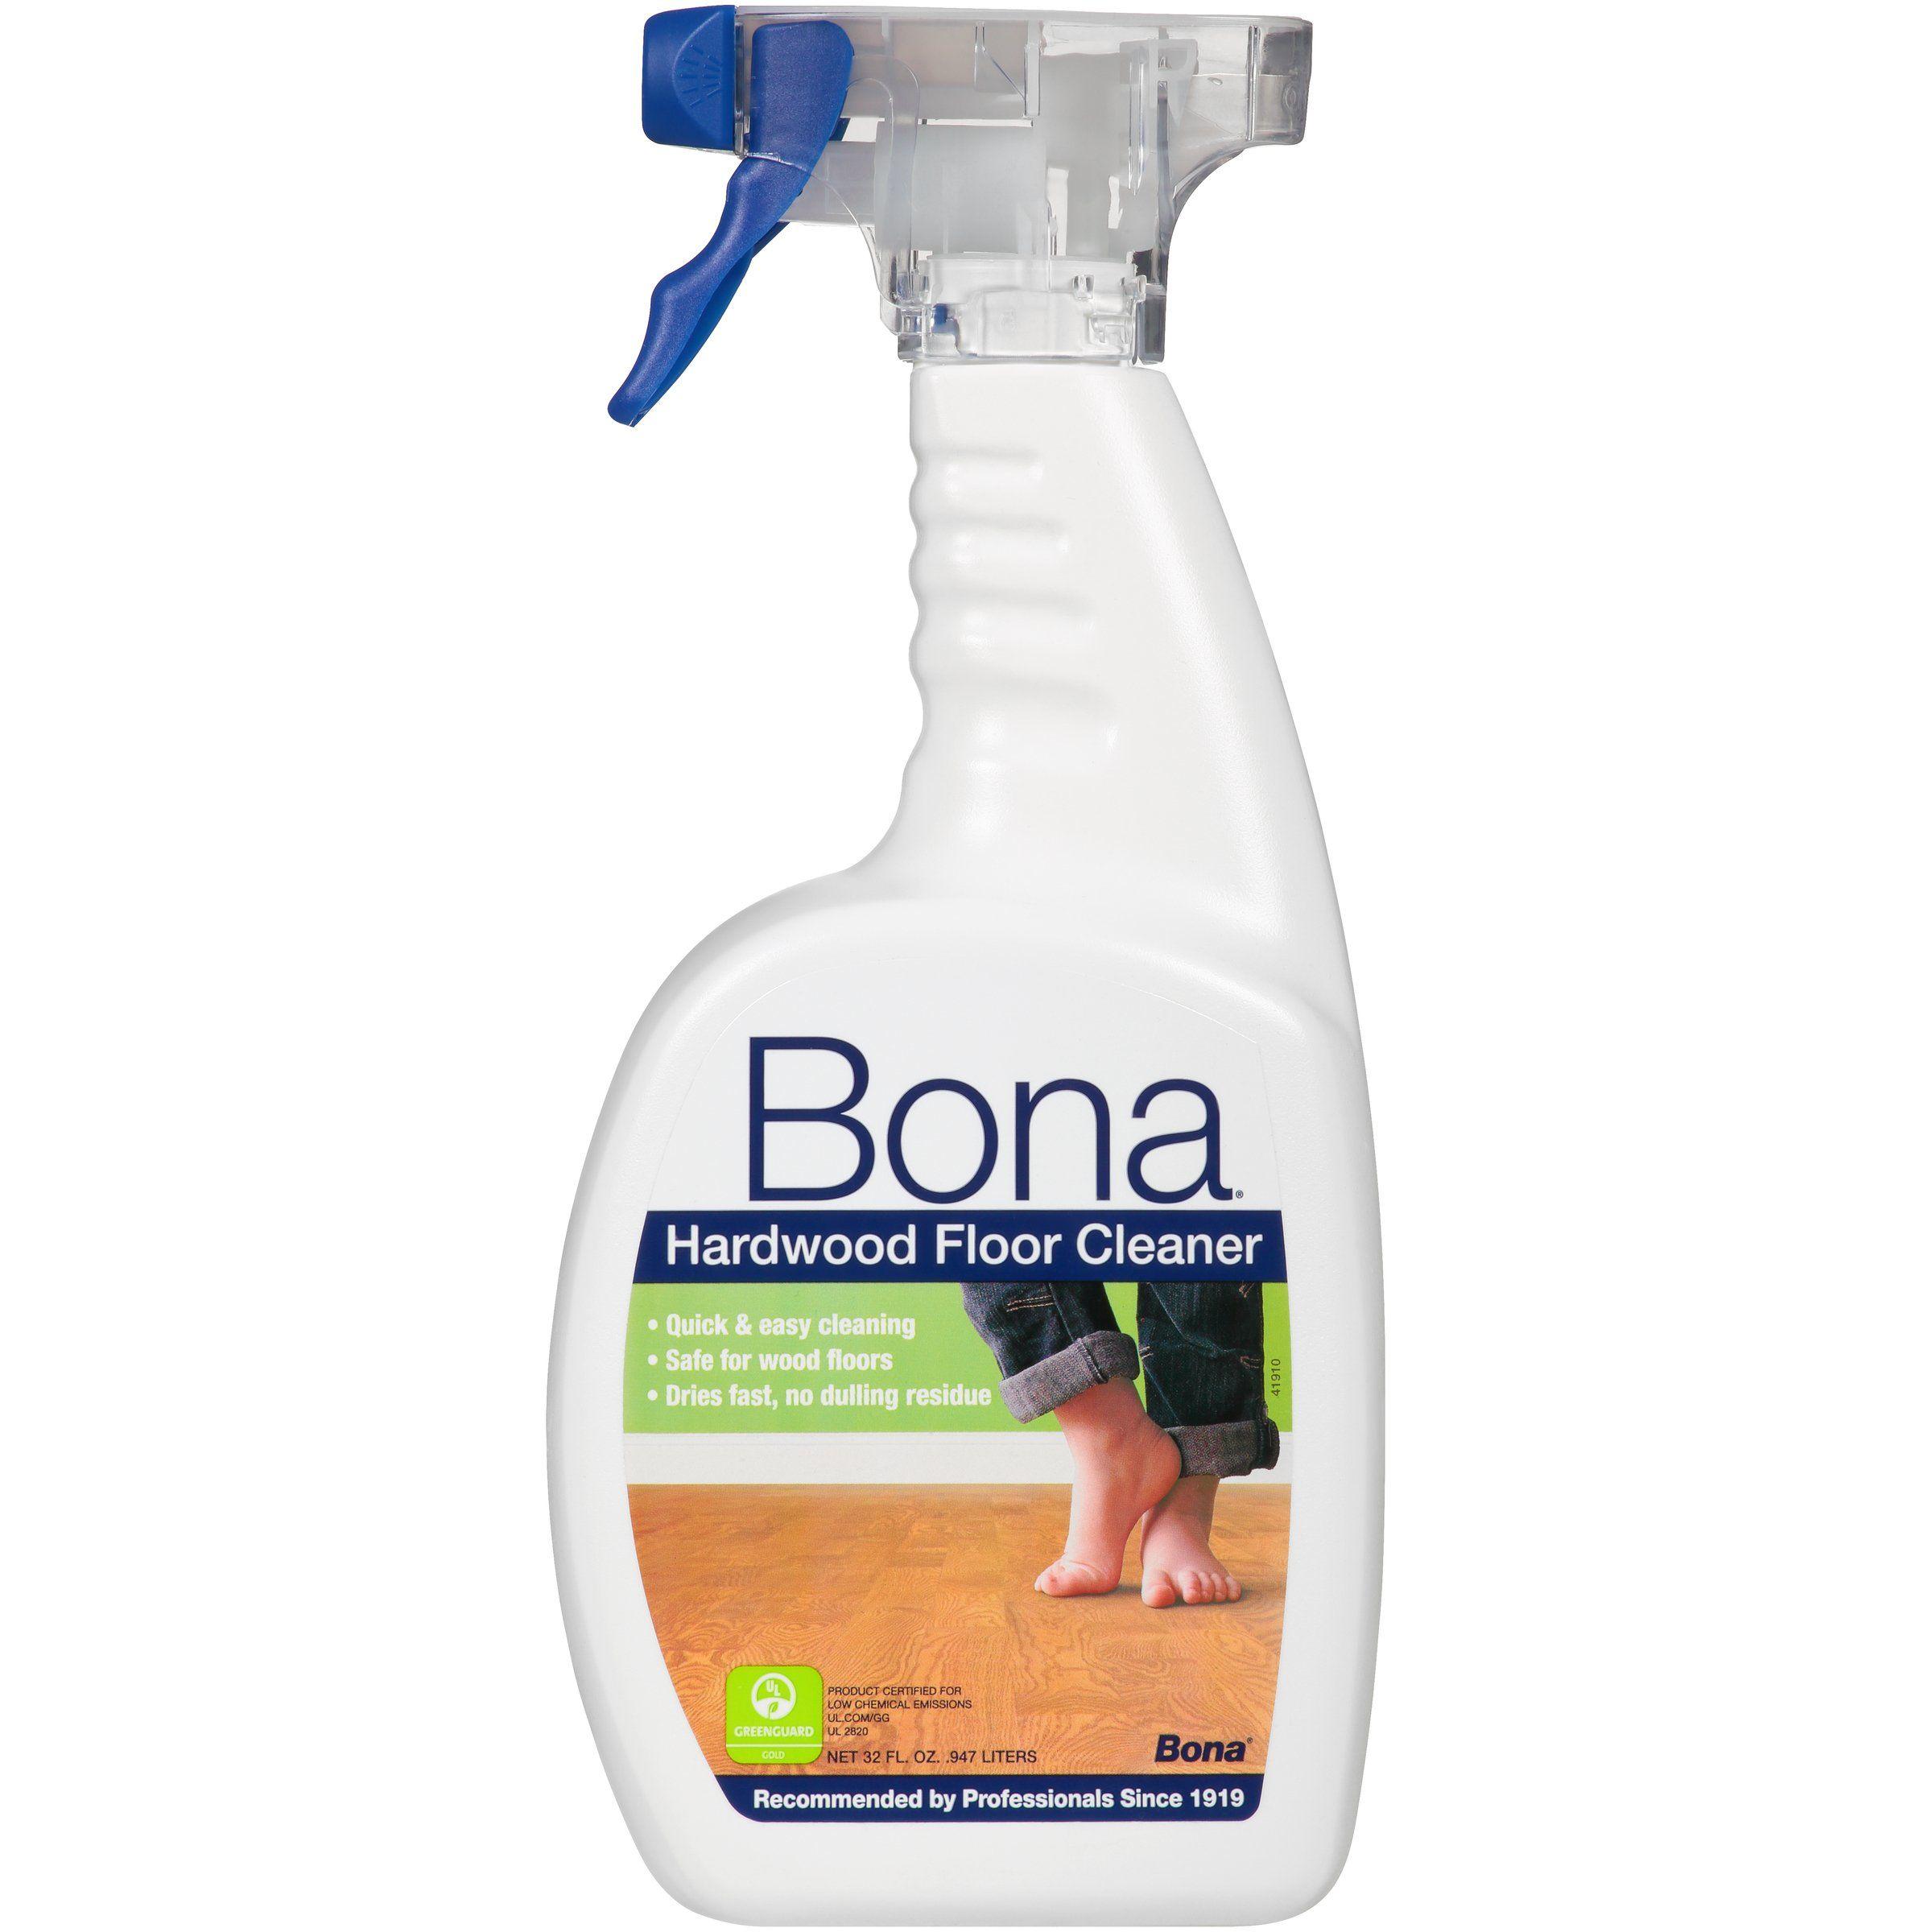 Bona Hardwood Floor Cleaner Spray 32 oz. * Check this